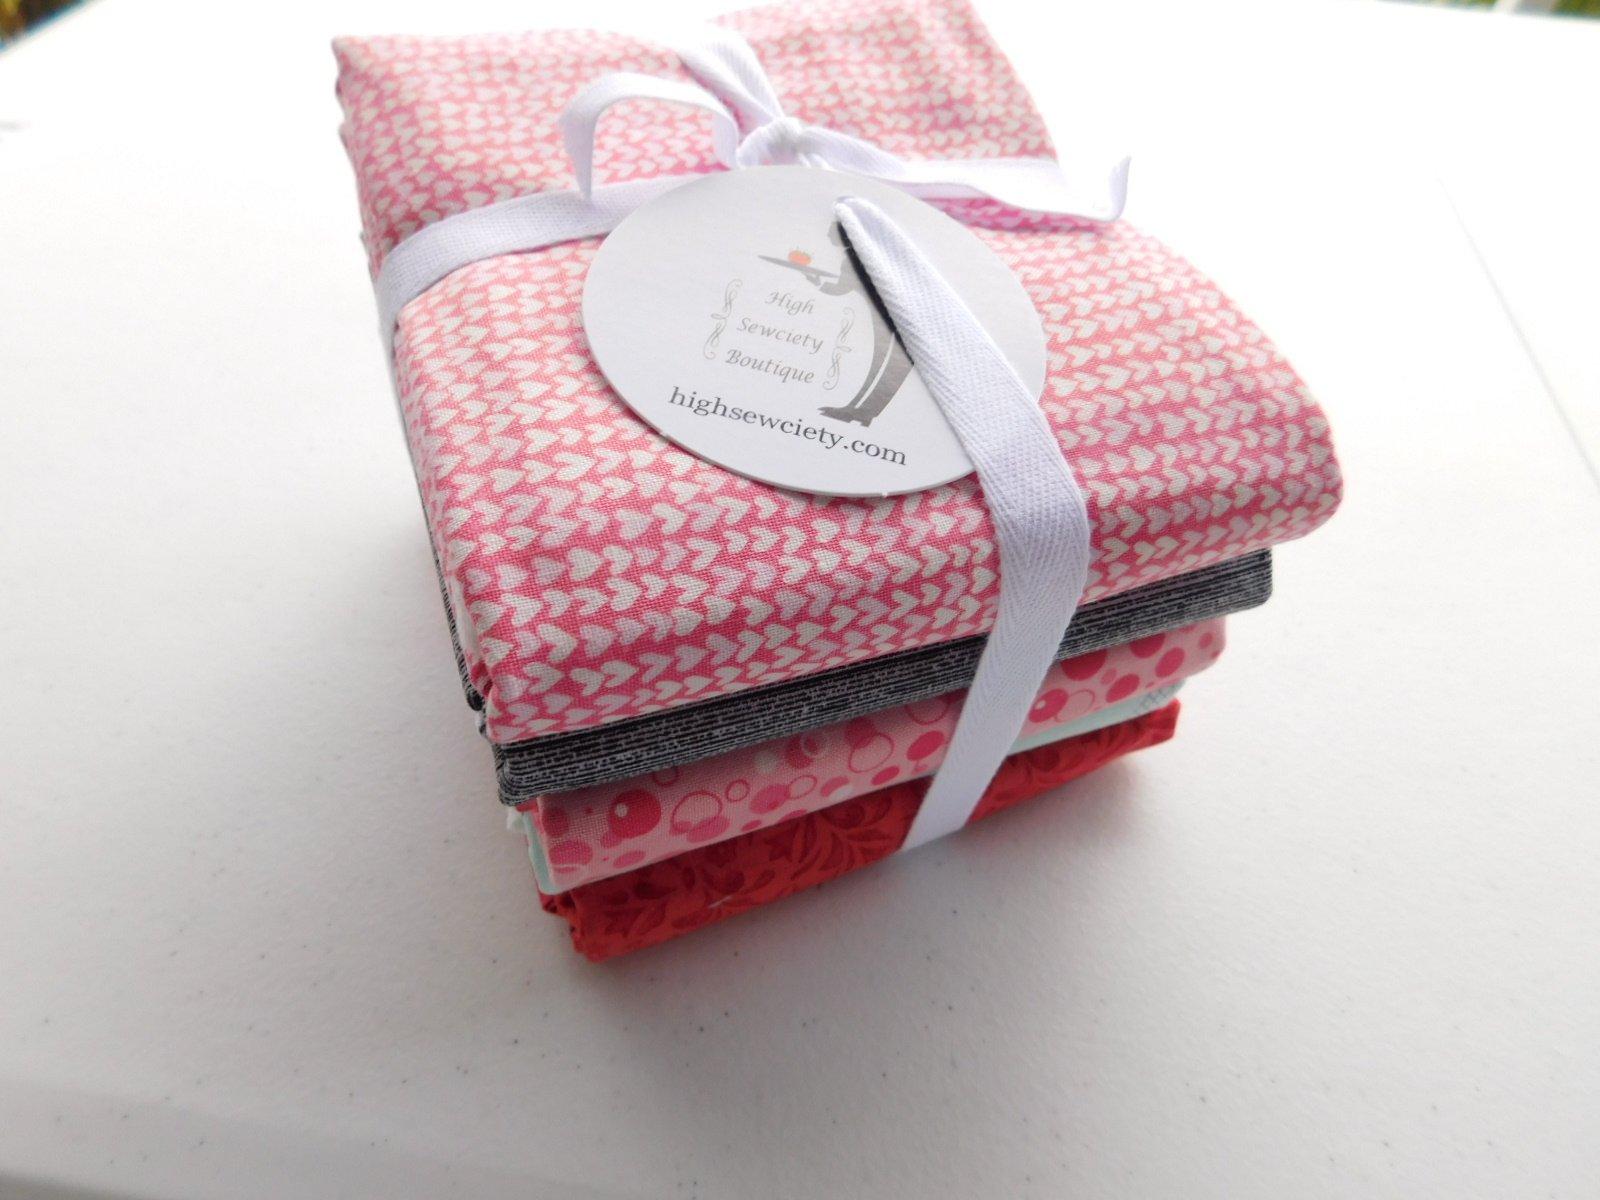 v2 Modern baby 1 yd fabric bundle-pink blue orange gray